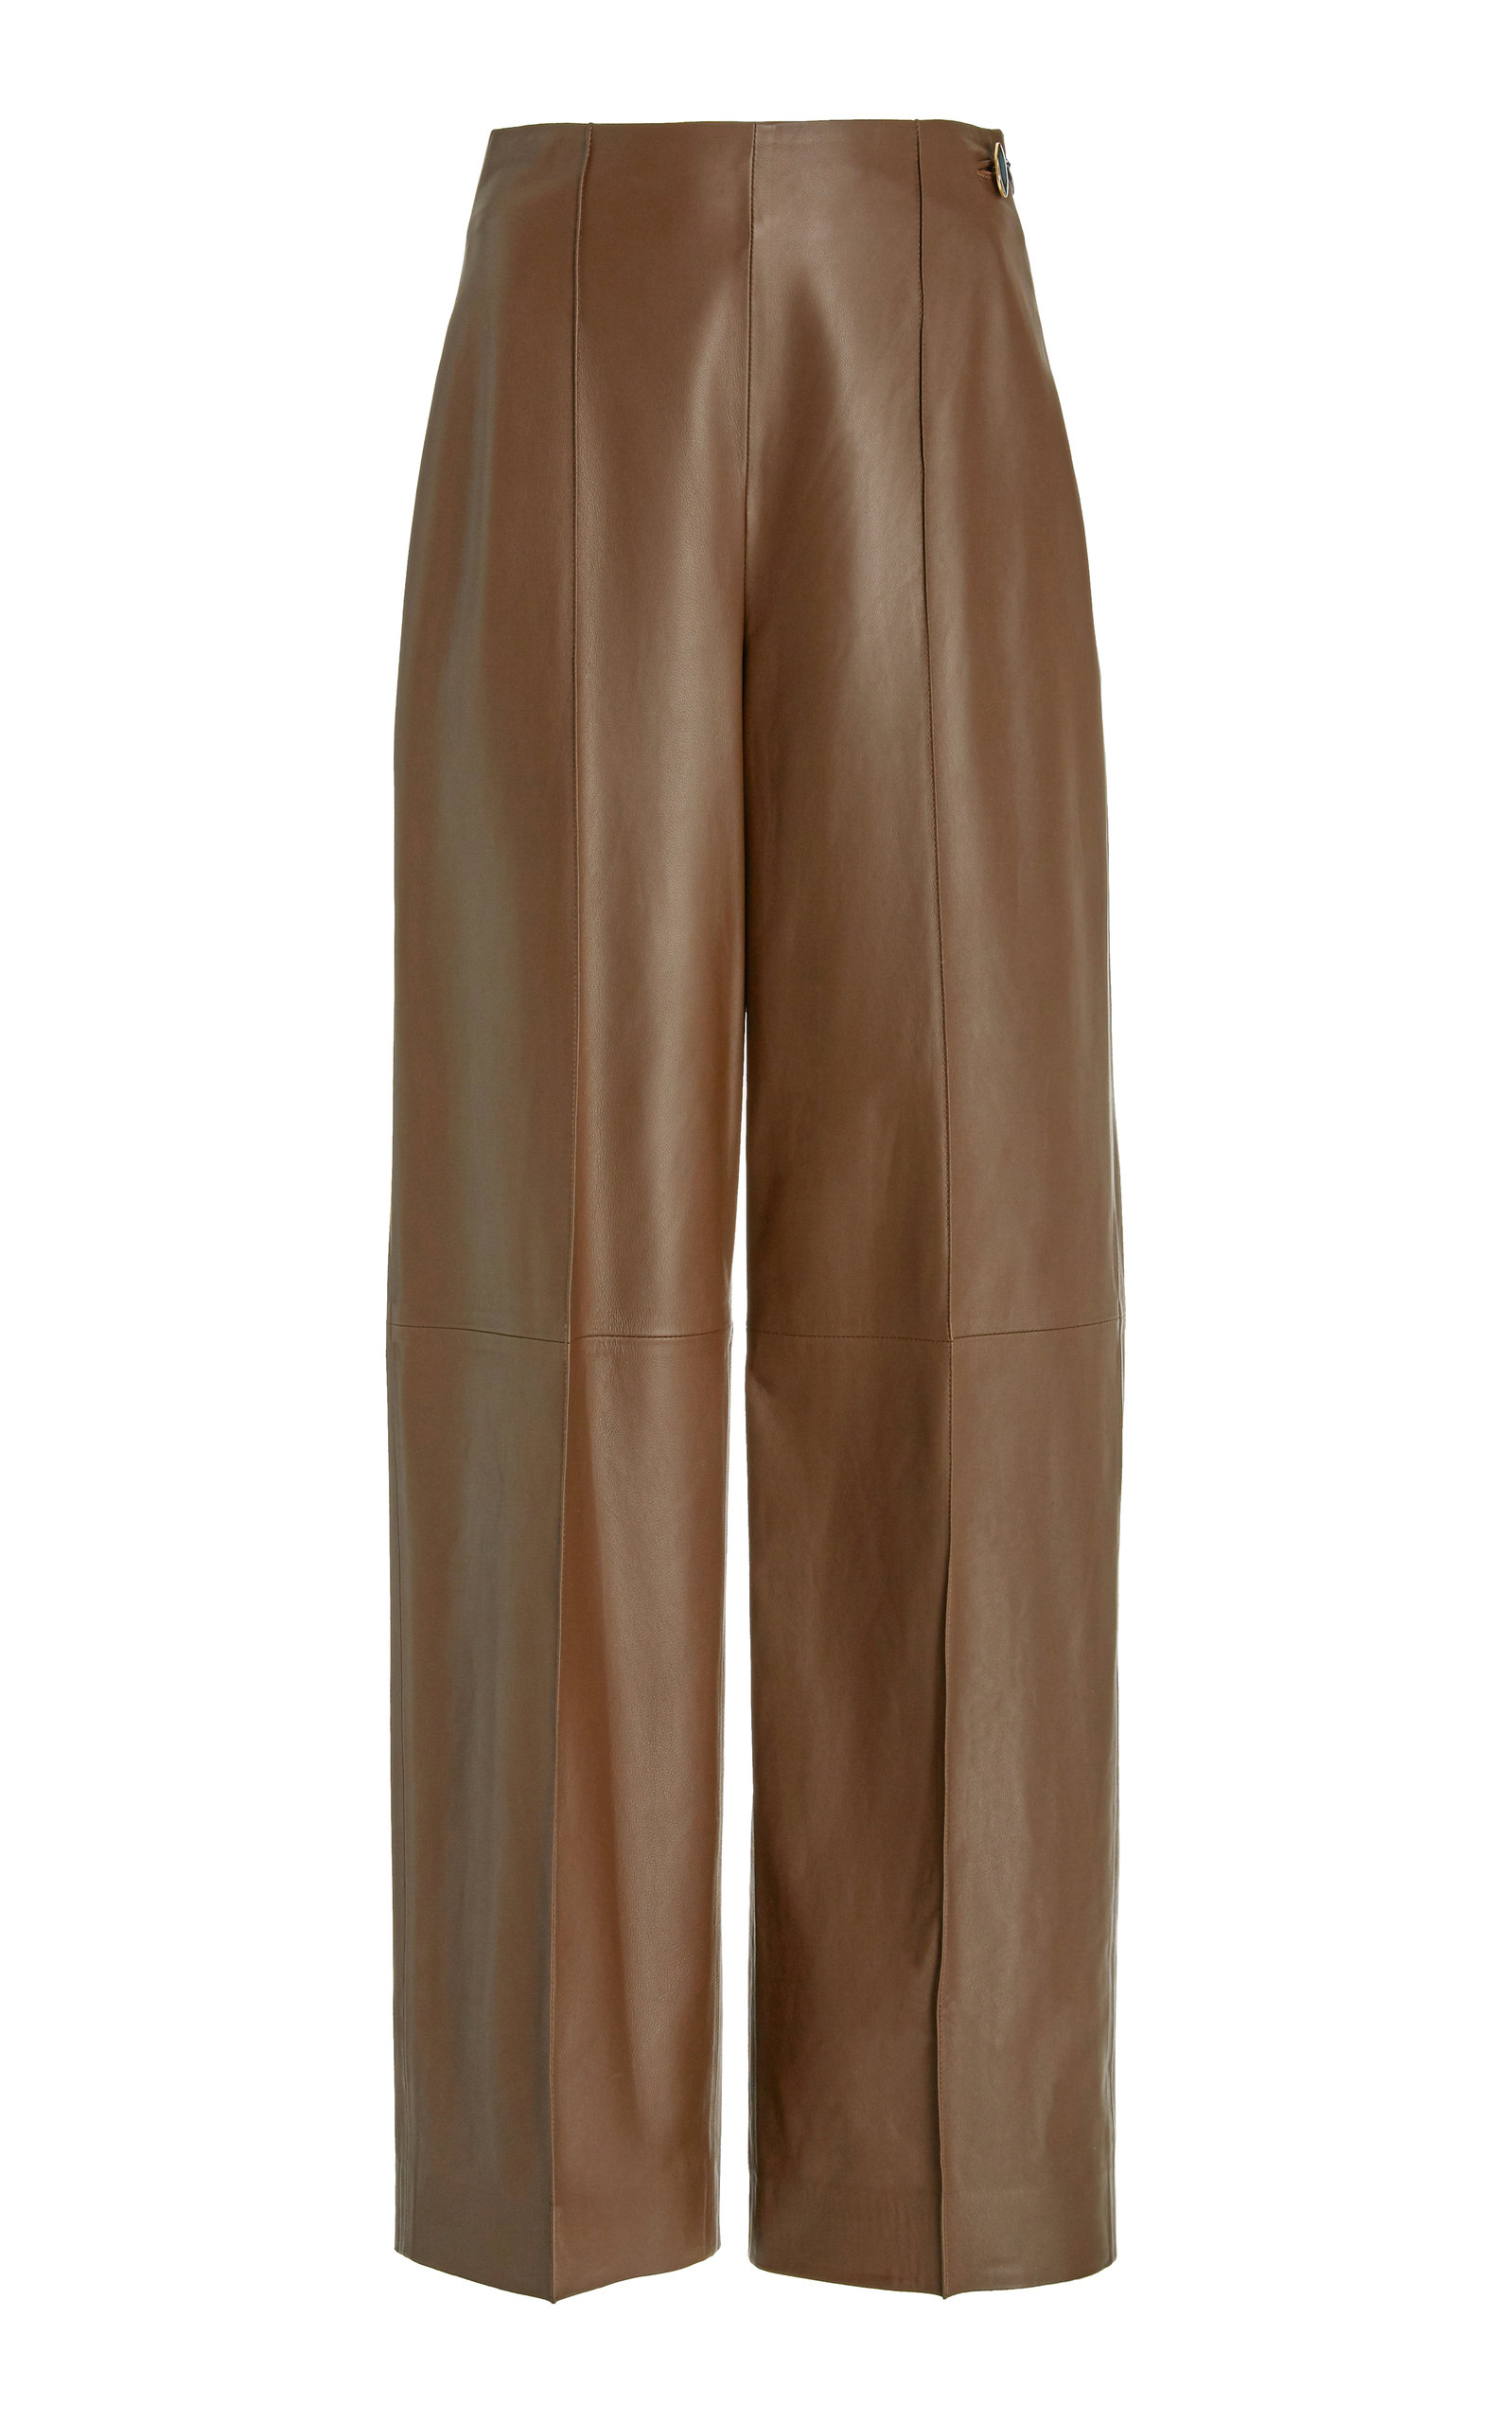 Vince - Women's Pintucked Leather Pants - Green - Moda Operandi